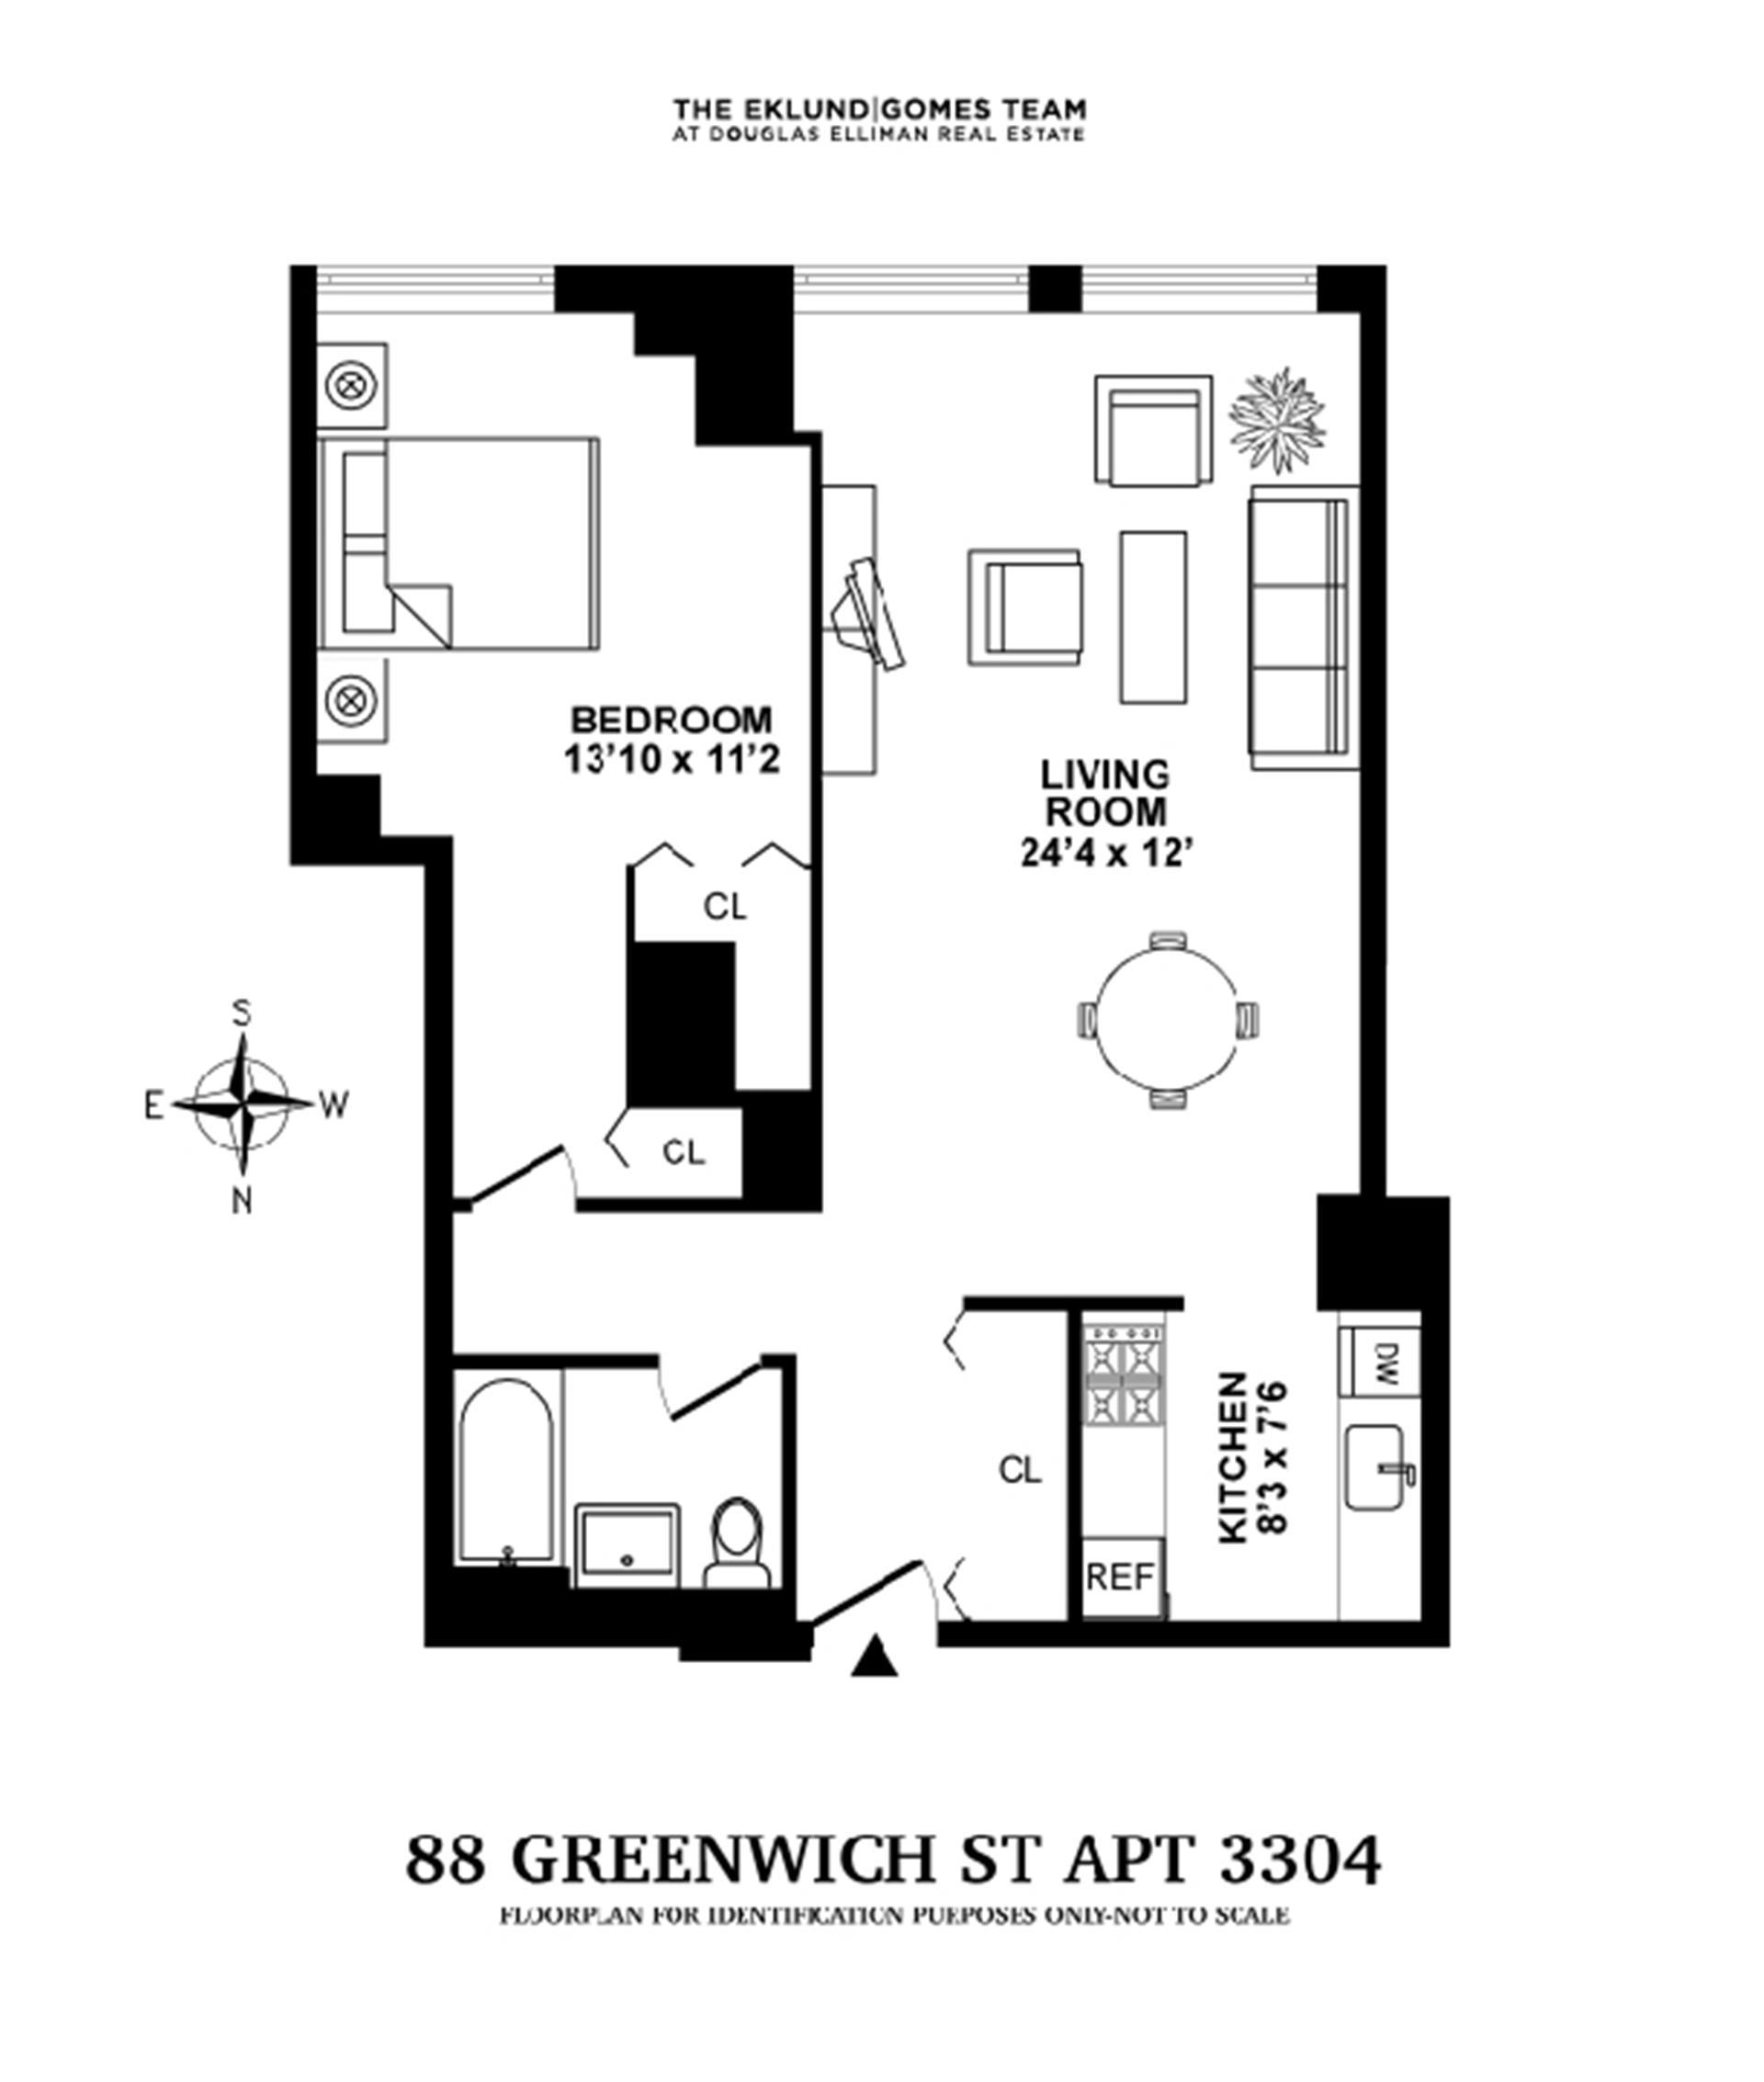 Floor plan of Greenwich Club Residence, 88 Greenwich Street, 3304 - Financial District, New York